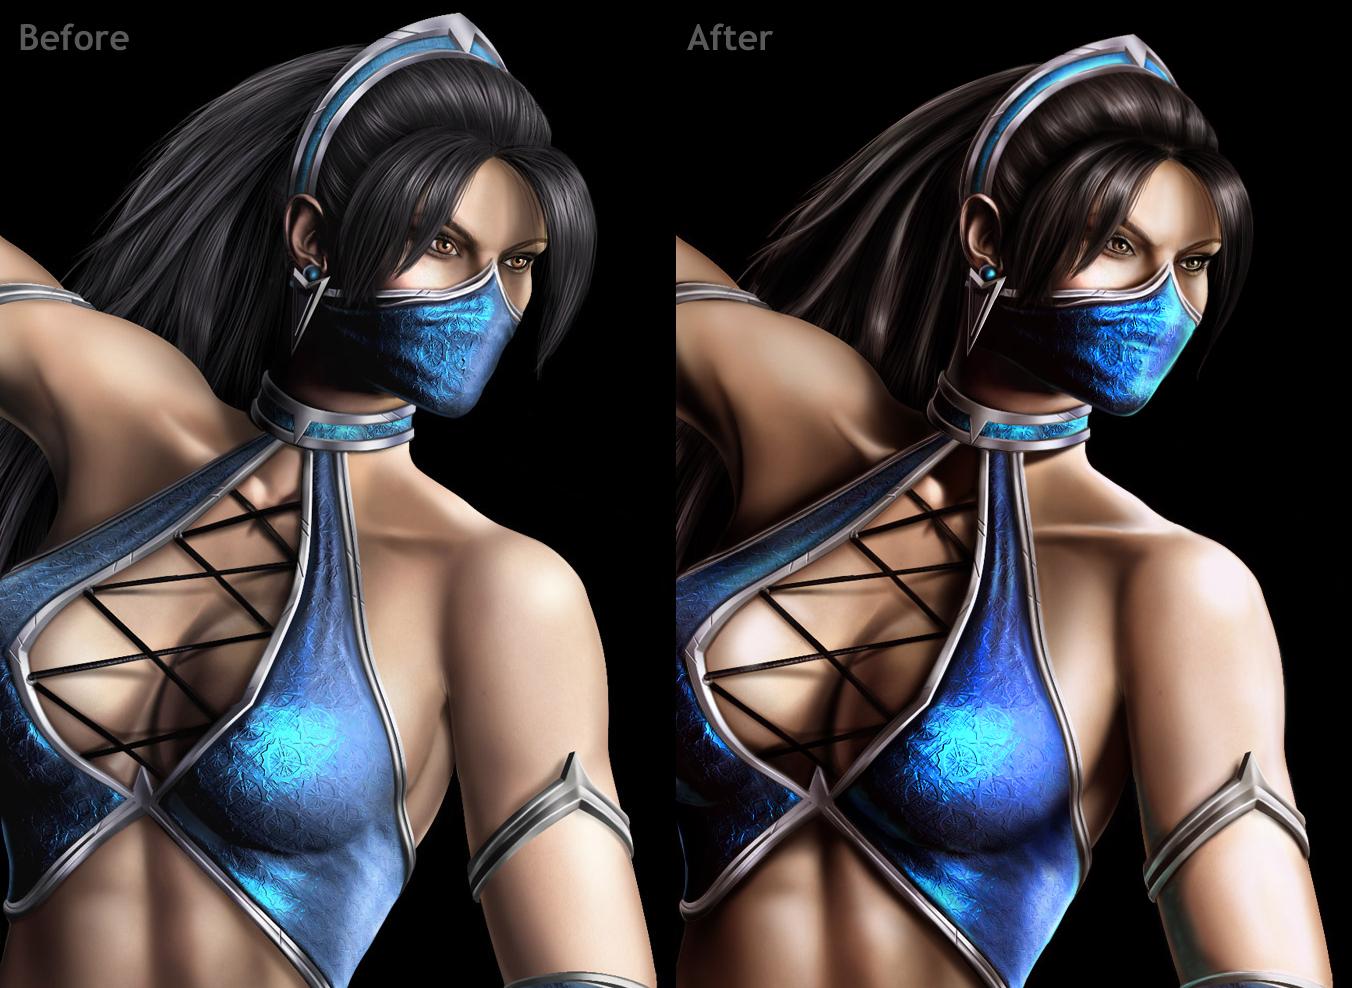 Kitana and Mileena Mortal Kombat Cosplay is Amazingly Sexy